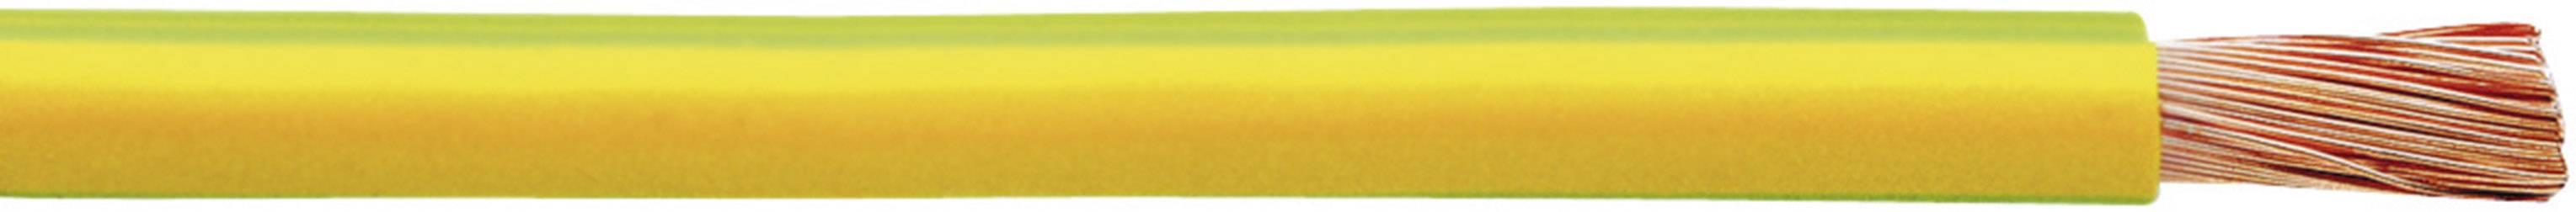 Opletenie / lanko Faber Kabel 040234 H07V-K, 1 x 16 mm², vonkajší Ø 7 mm, metrový tovar, svetlomodrá